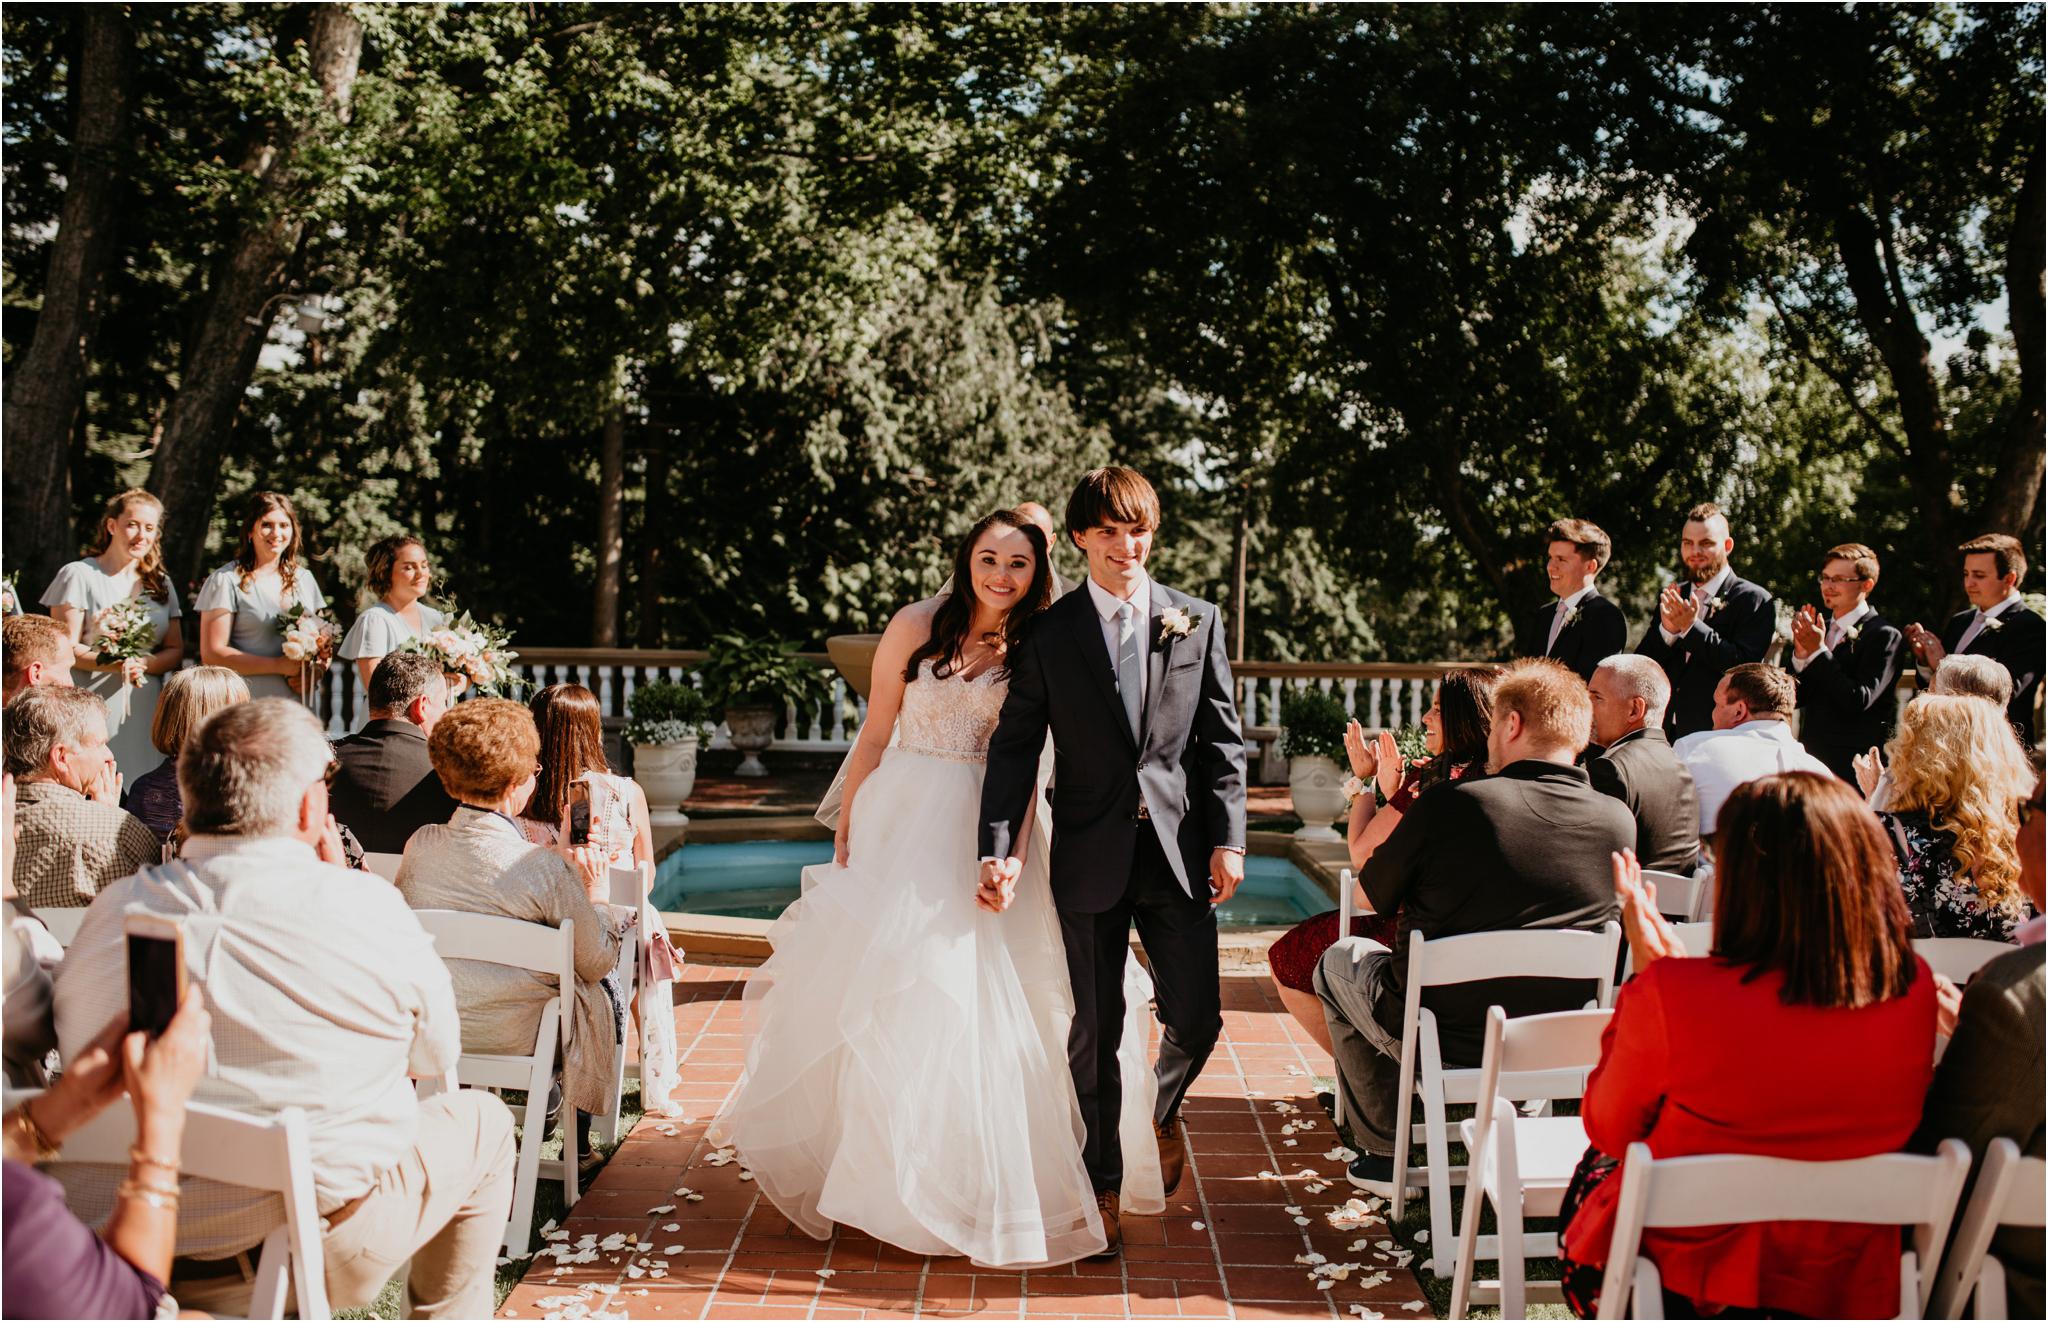 chance-and-ondrea-lairmont-manor-wedding-seattle-photographer-084.jpg